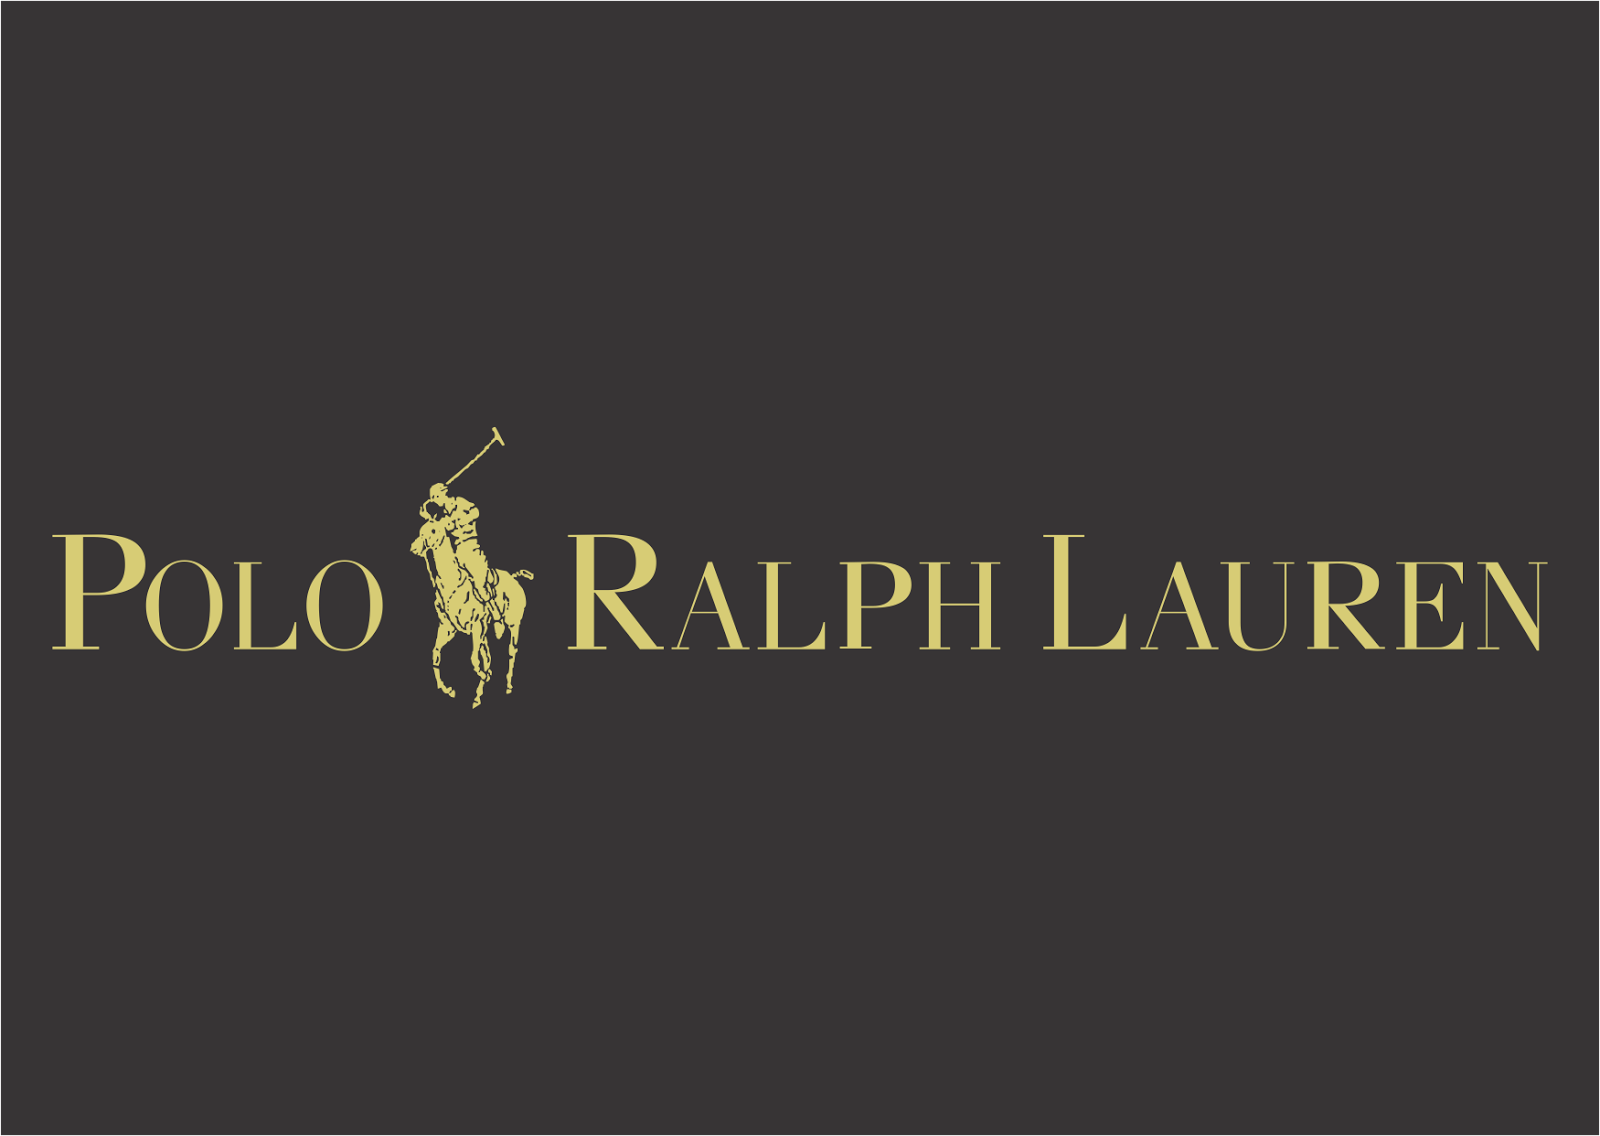 Polo Ralph Lauren Logo Vector Wallpaper Hd Background